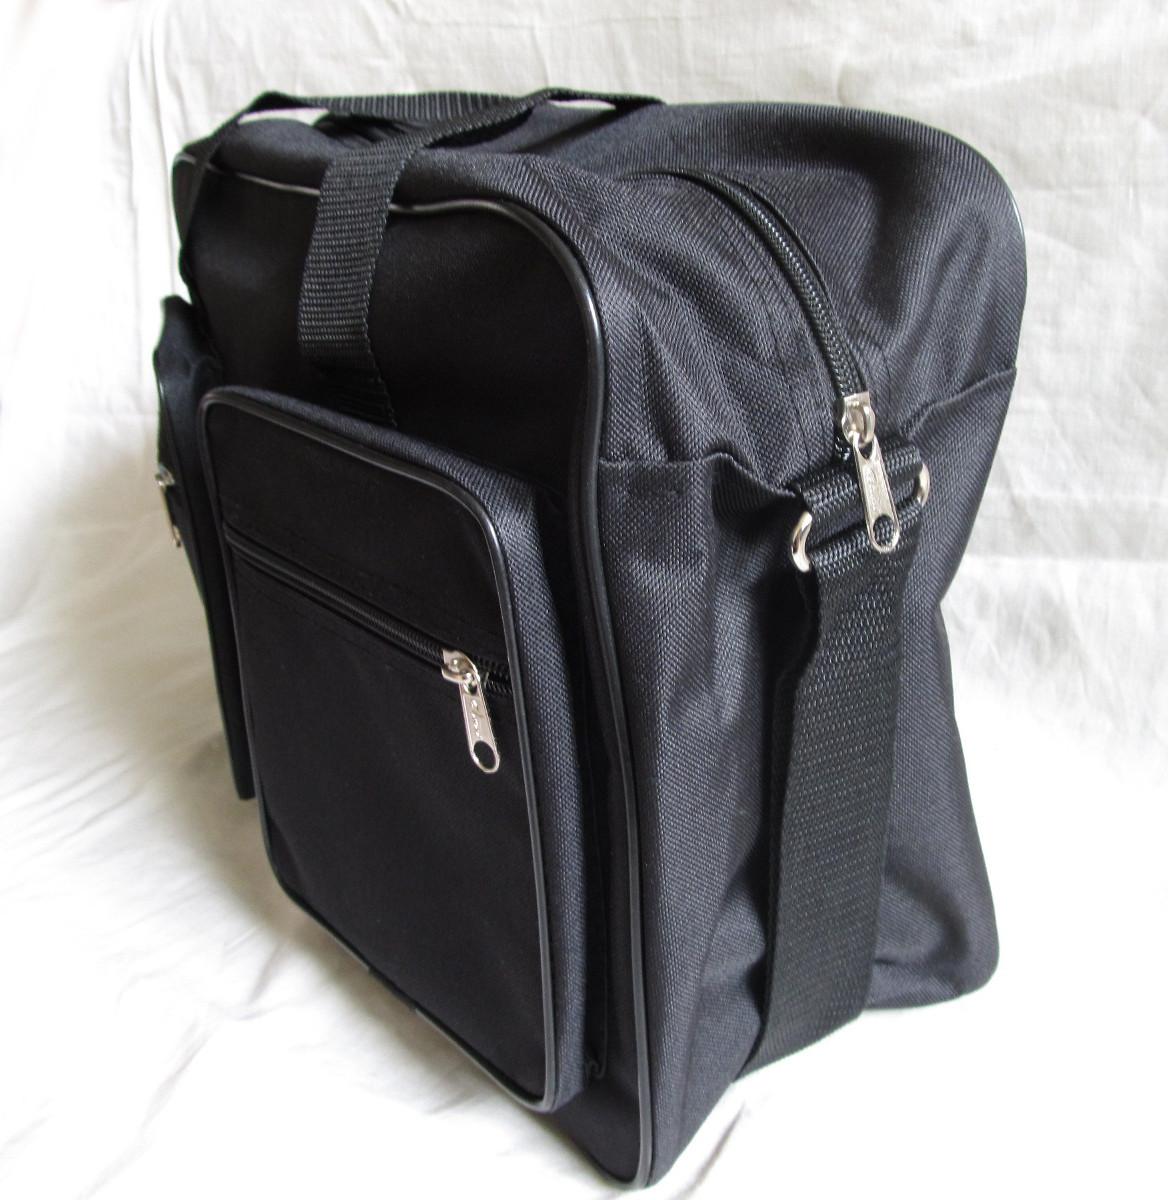 490f2b2bbe99 Мужская сумка Wallaby 2670 черная барсетка через плечо папка портфель А4+  42х28х14см, ...